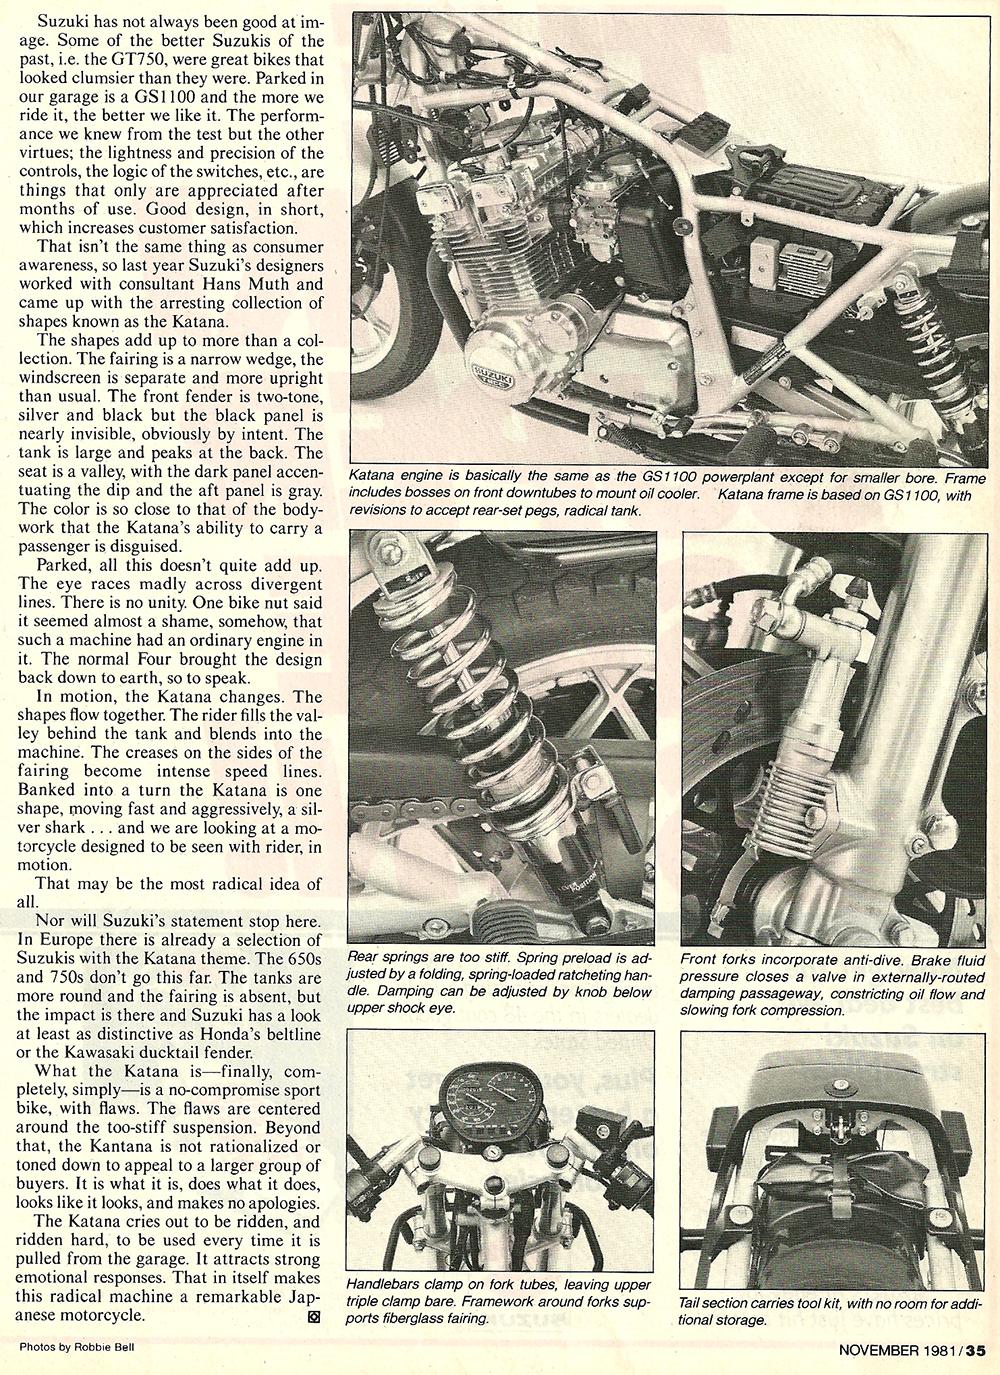 1981 Suzuki GS1000S Katana road test 6.jpg